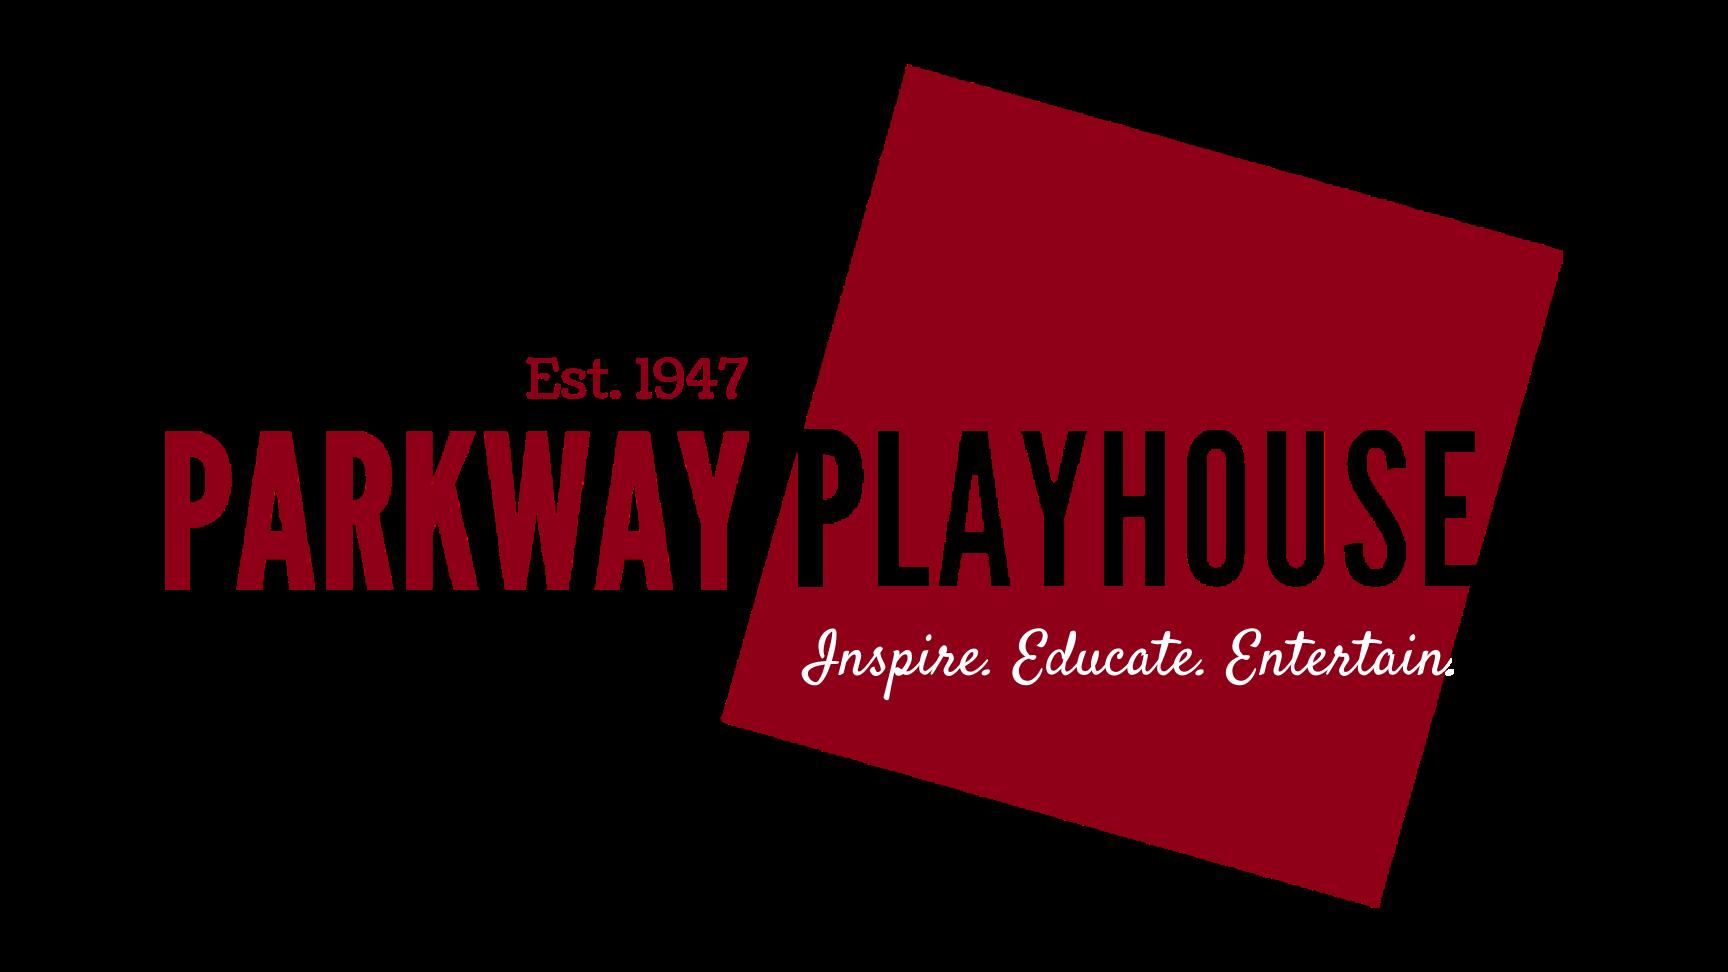 Parkway Playhouse